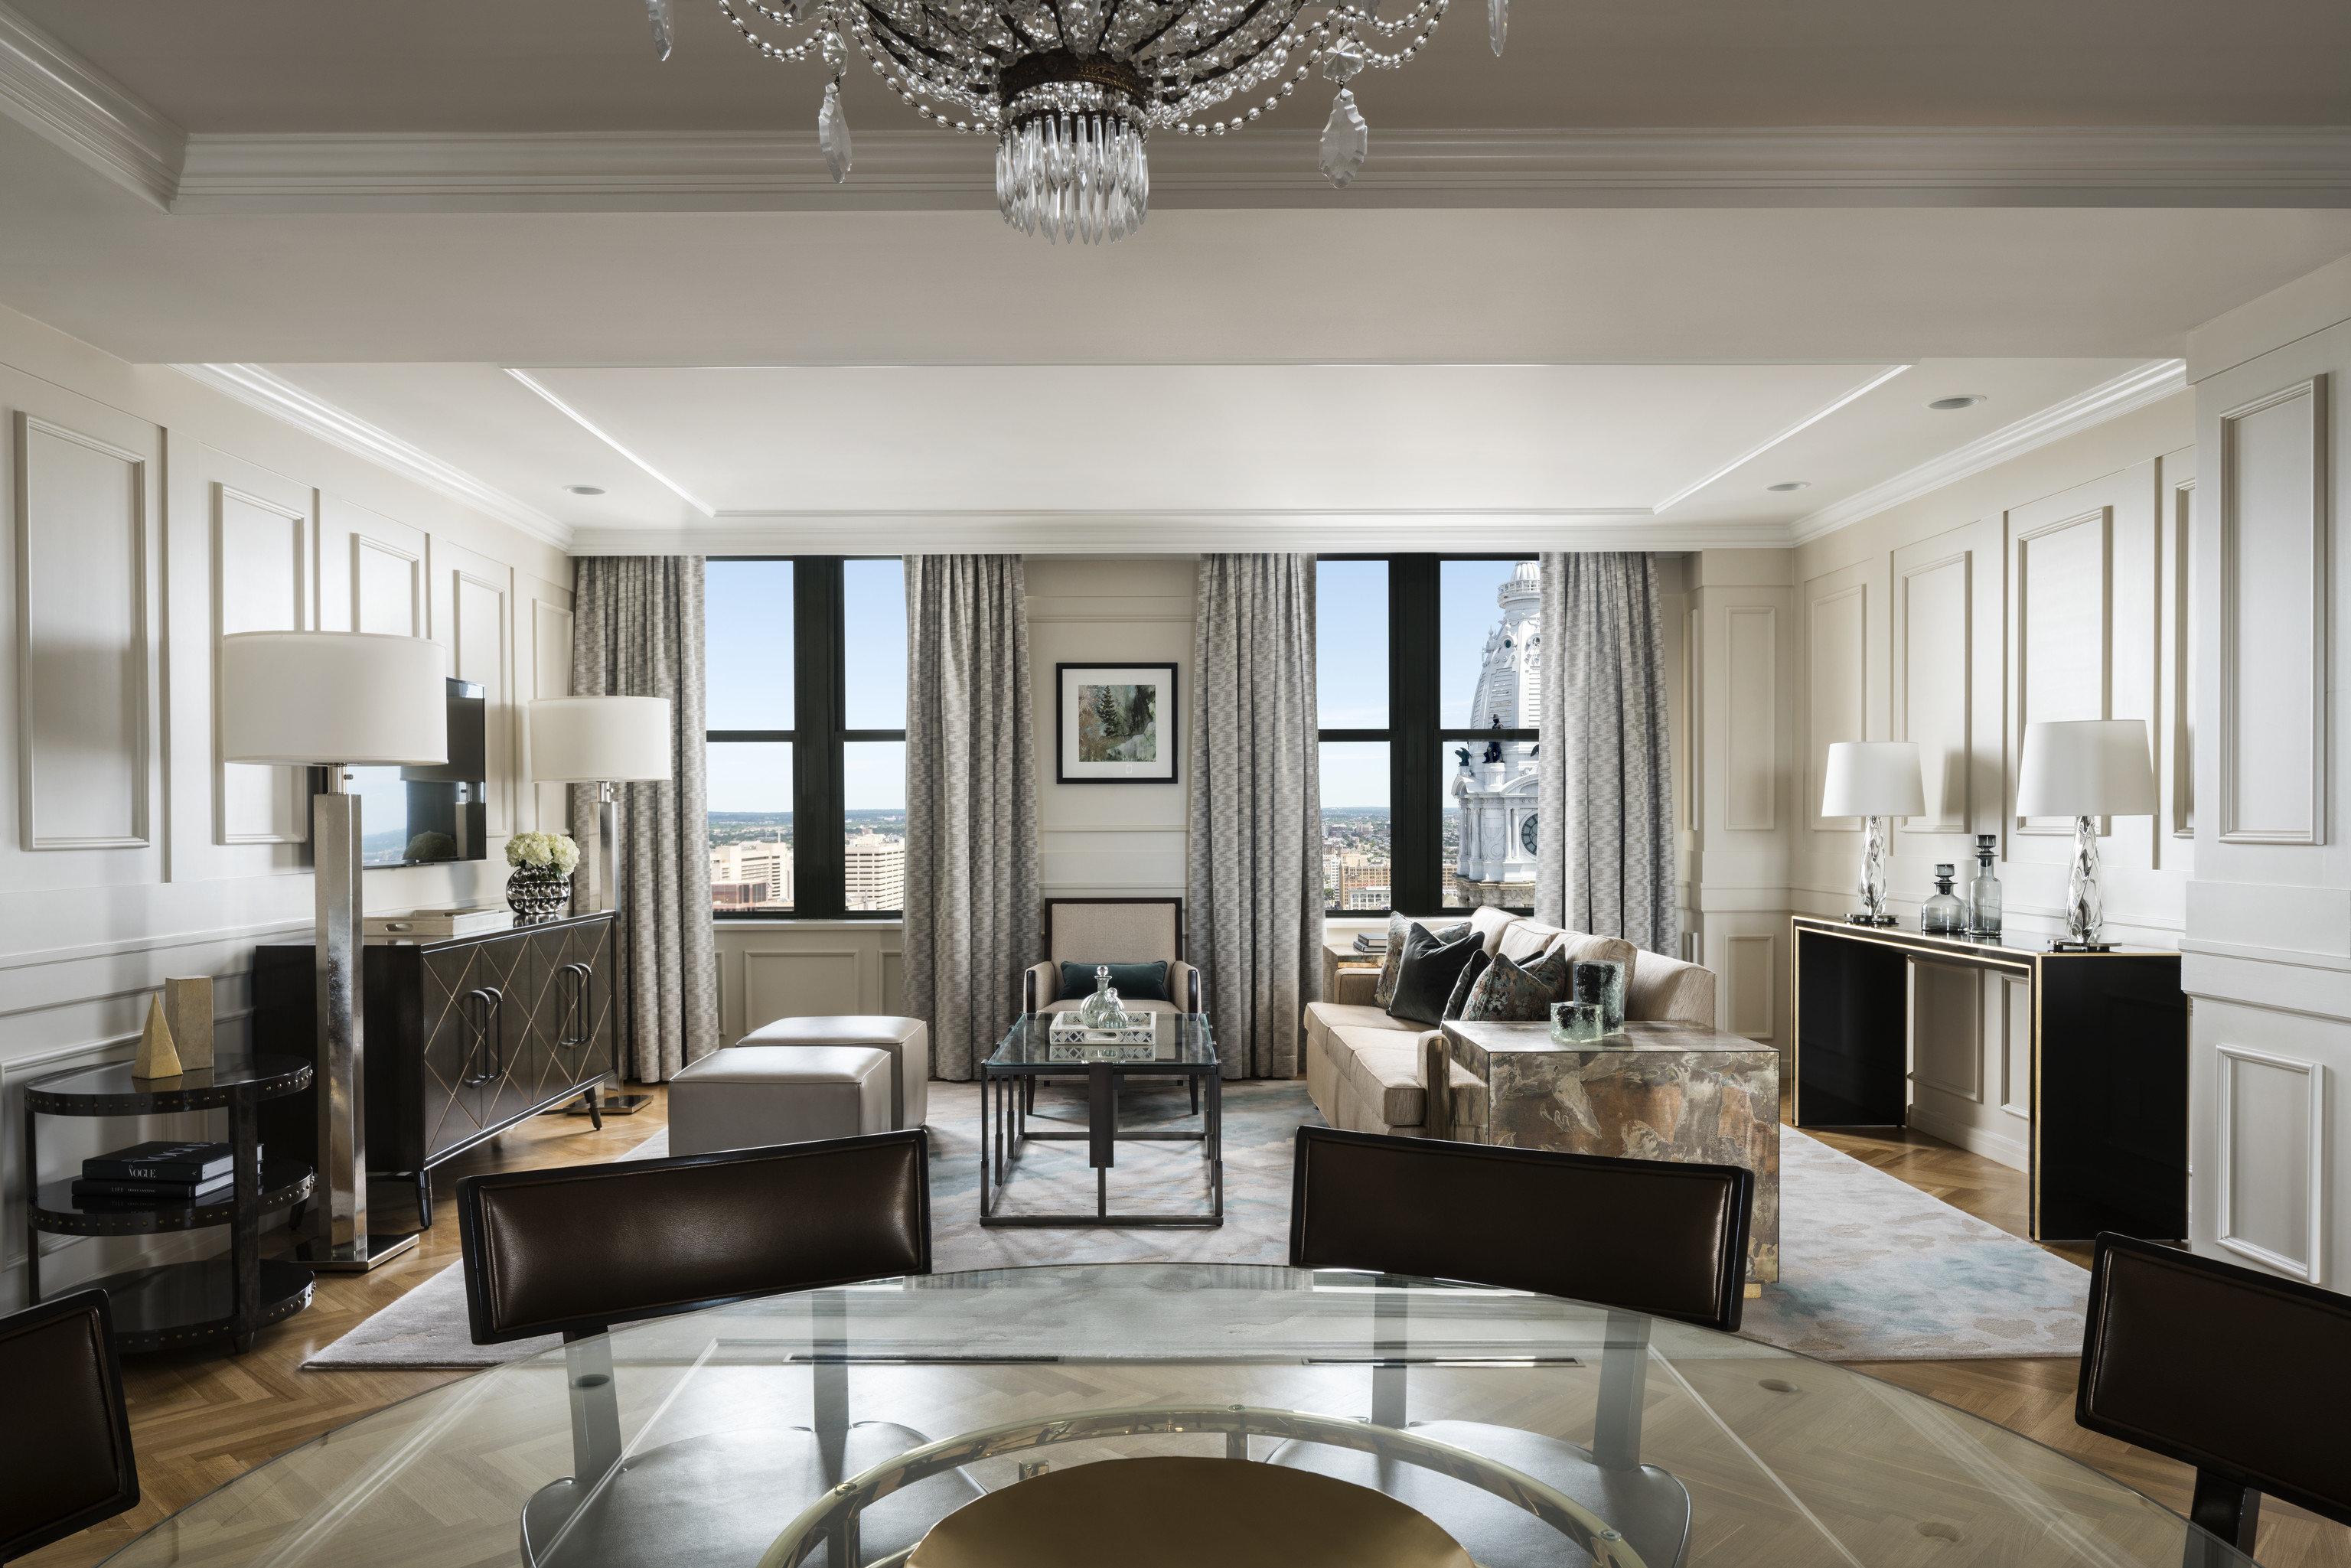 Boutique Hotels Hotels Philadelphia living room interior designer flooring Modern Island